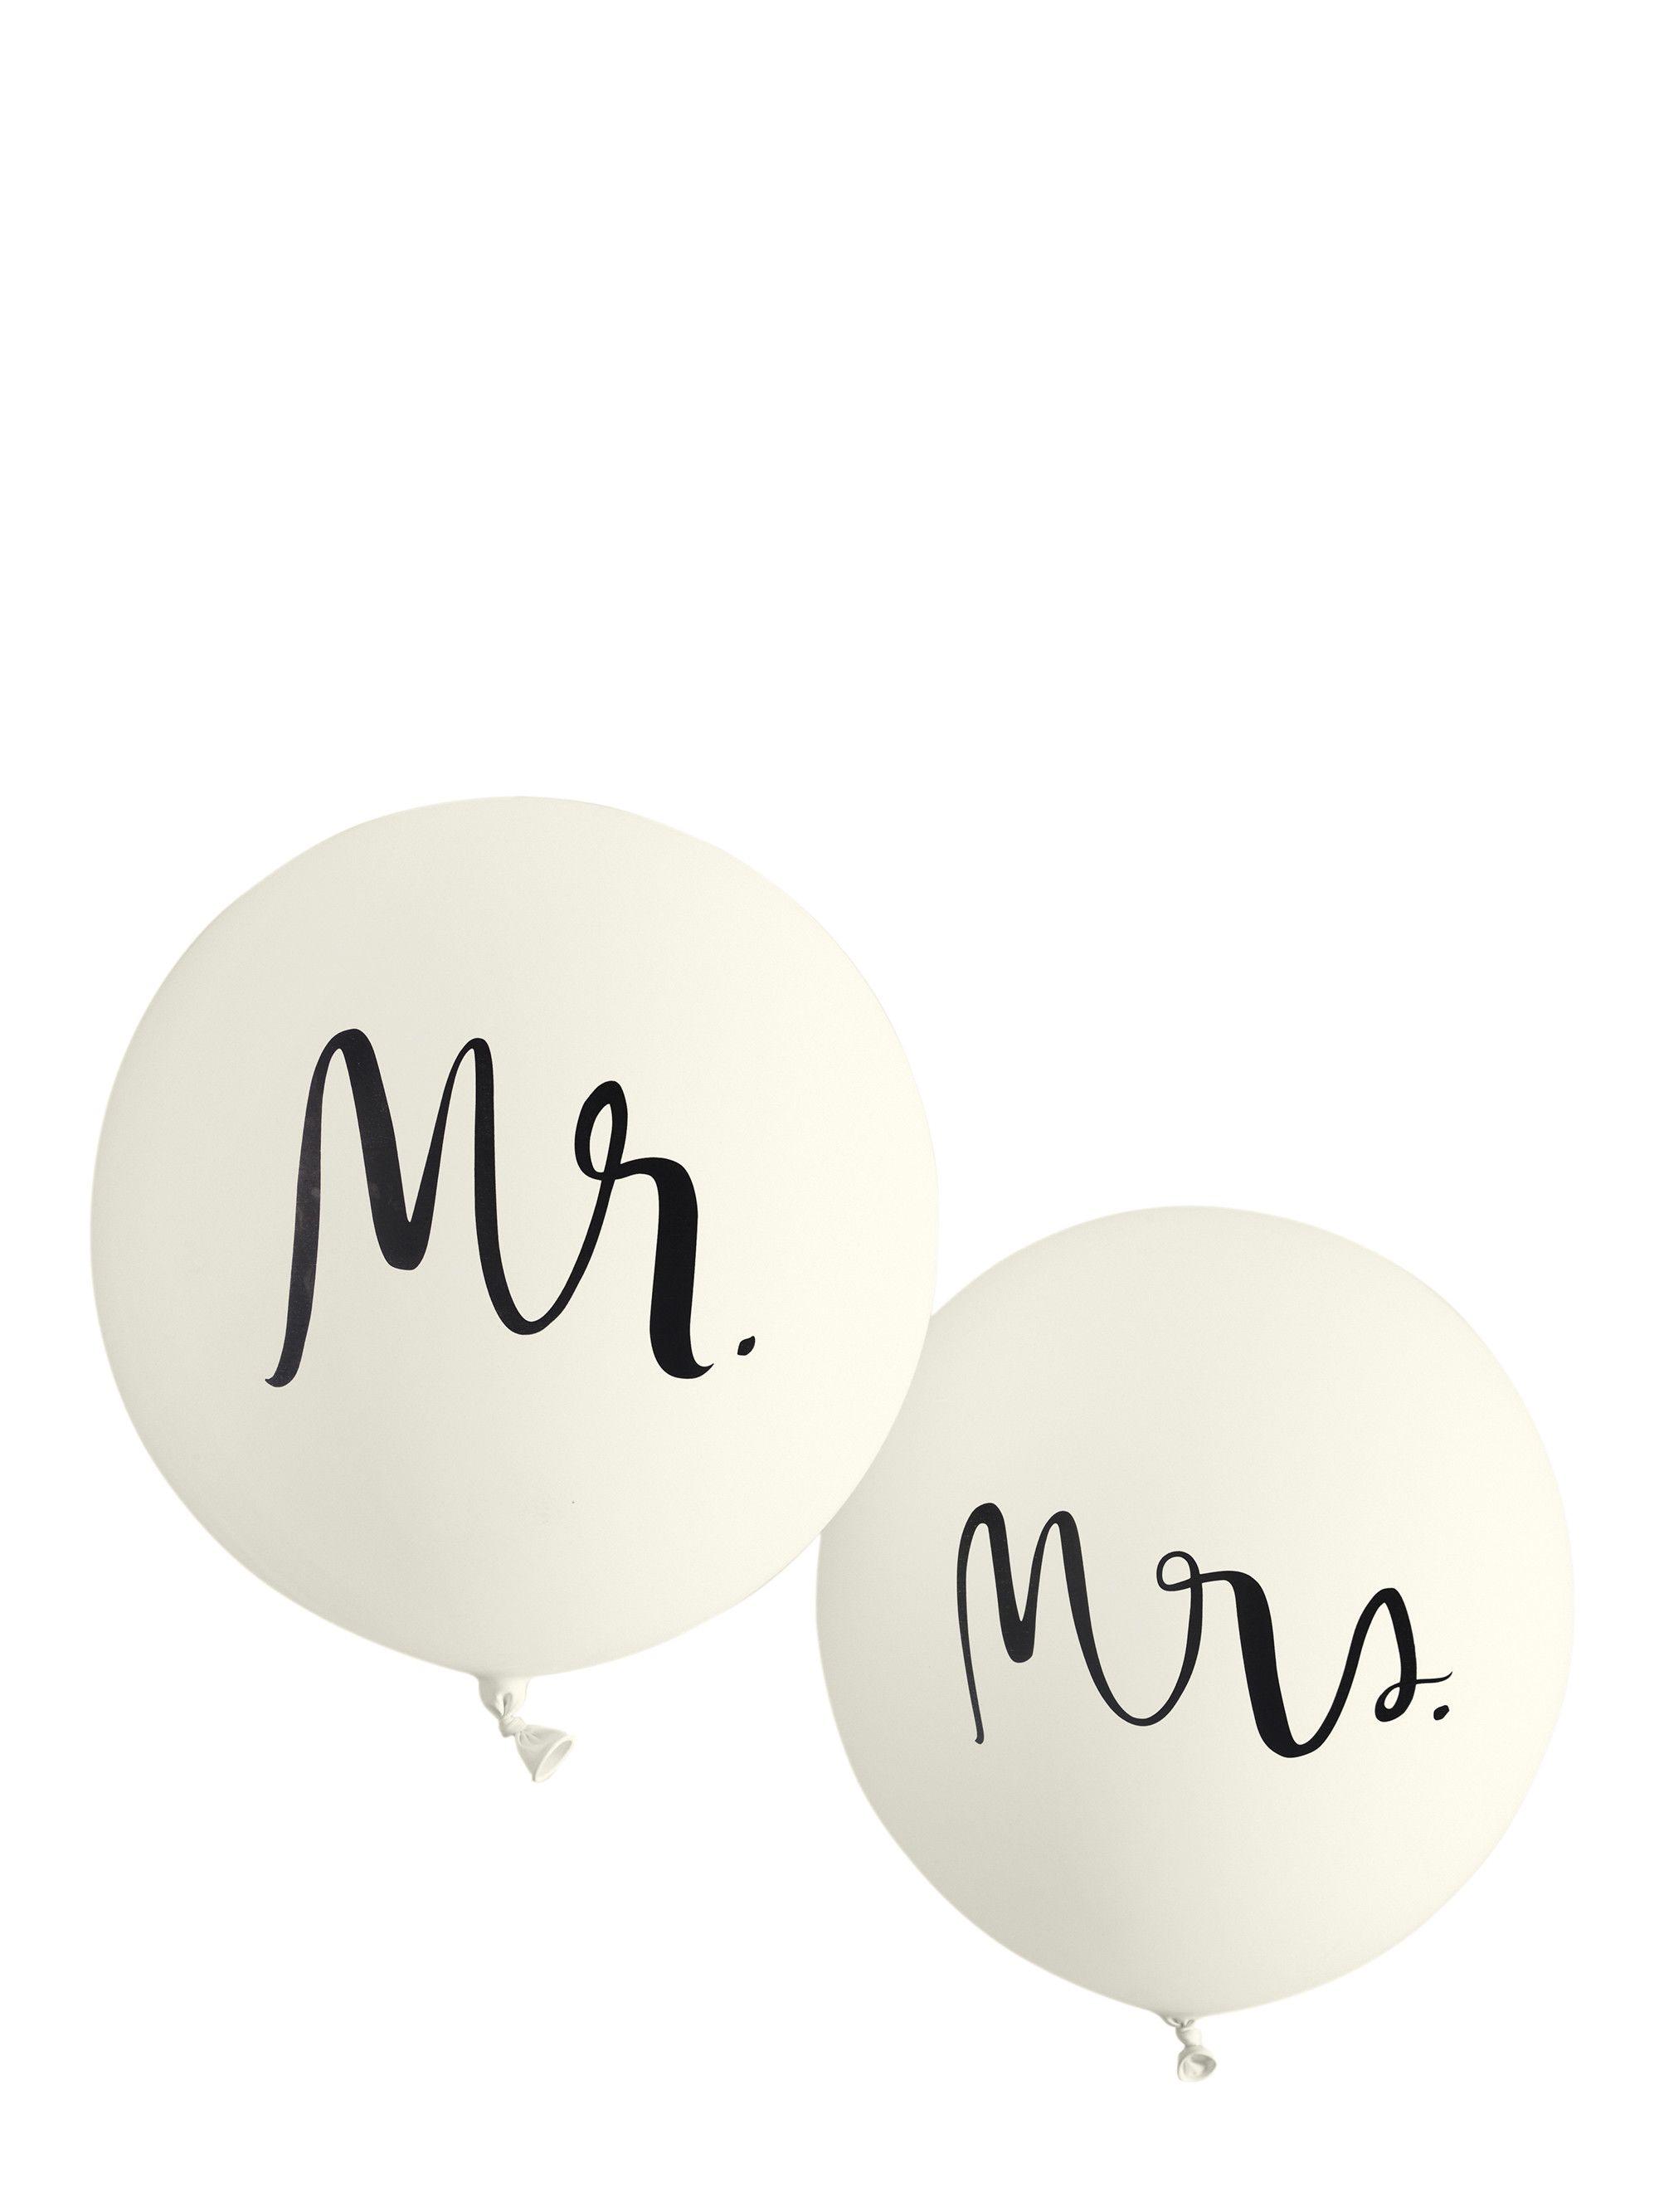 a30cad58242 mr. and mrs. balloon set - kate spade new york | Wedding | Bridal ...